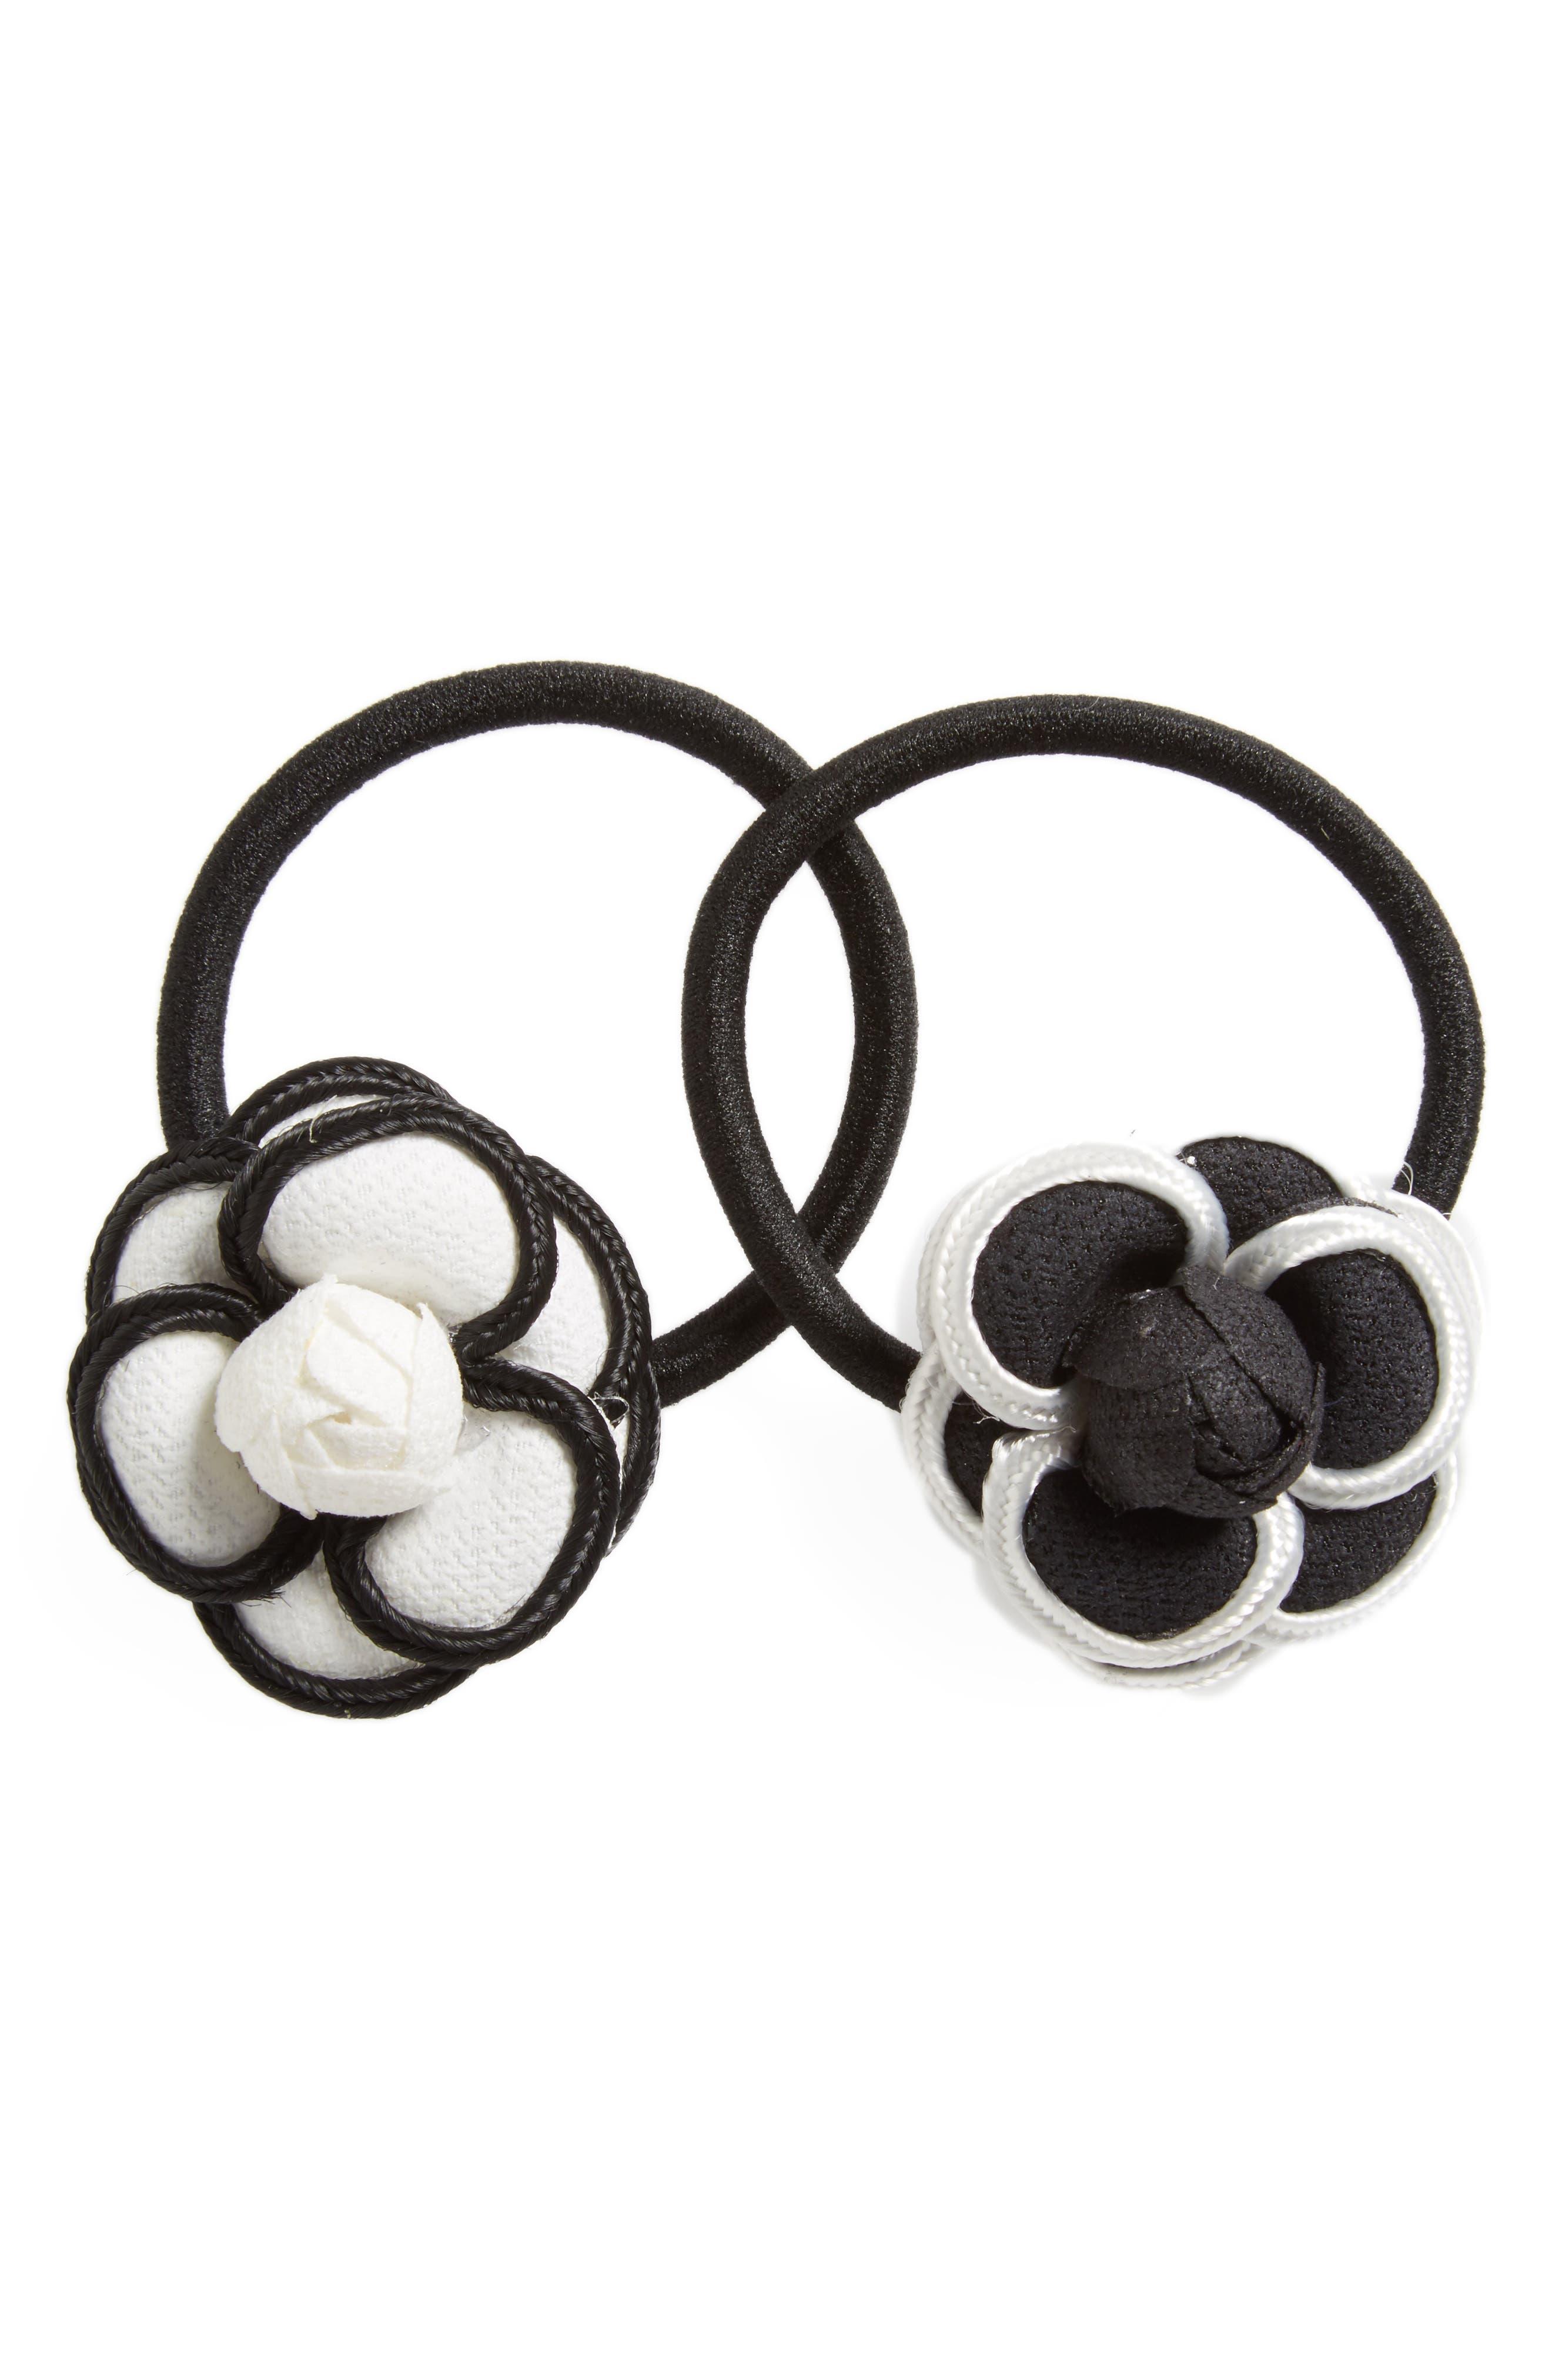 2-Pack Floral Ponytail Holders,                             Main thumbnail 1, color,                             Black/White